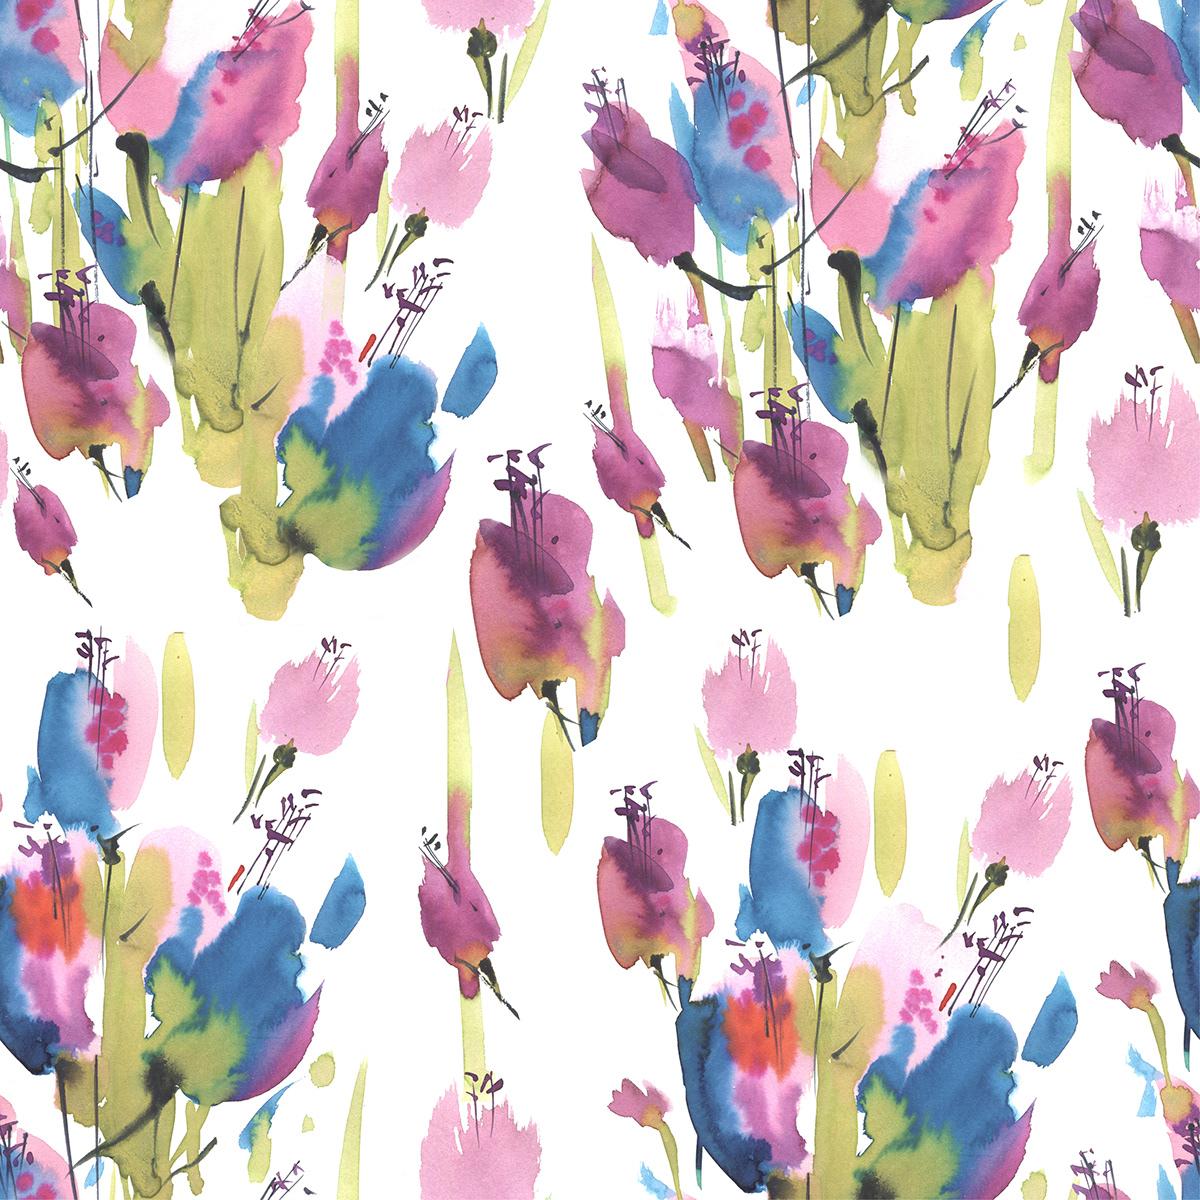 artist botanic Flowers graphic art Illustrator pattern plants watercolor